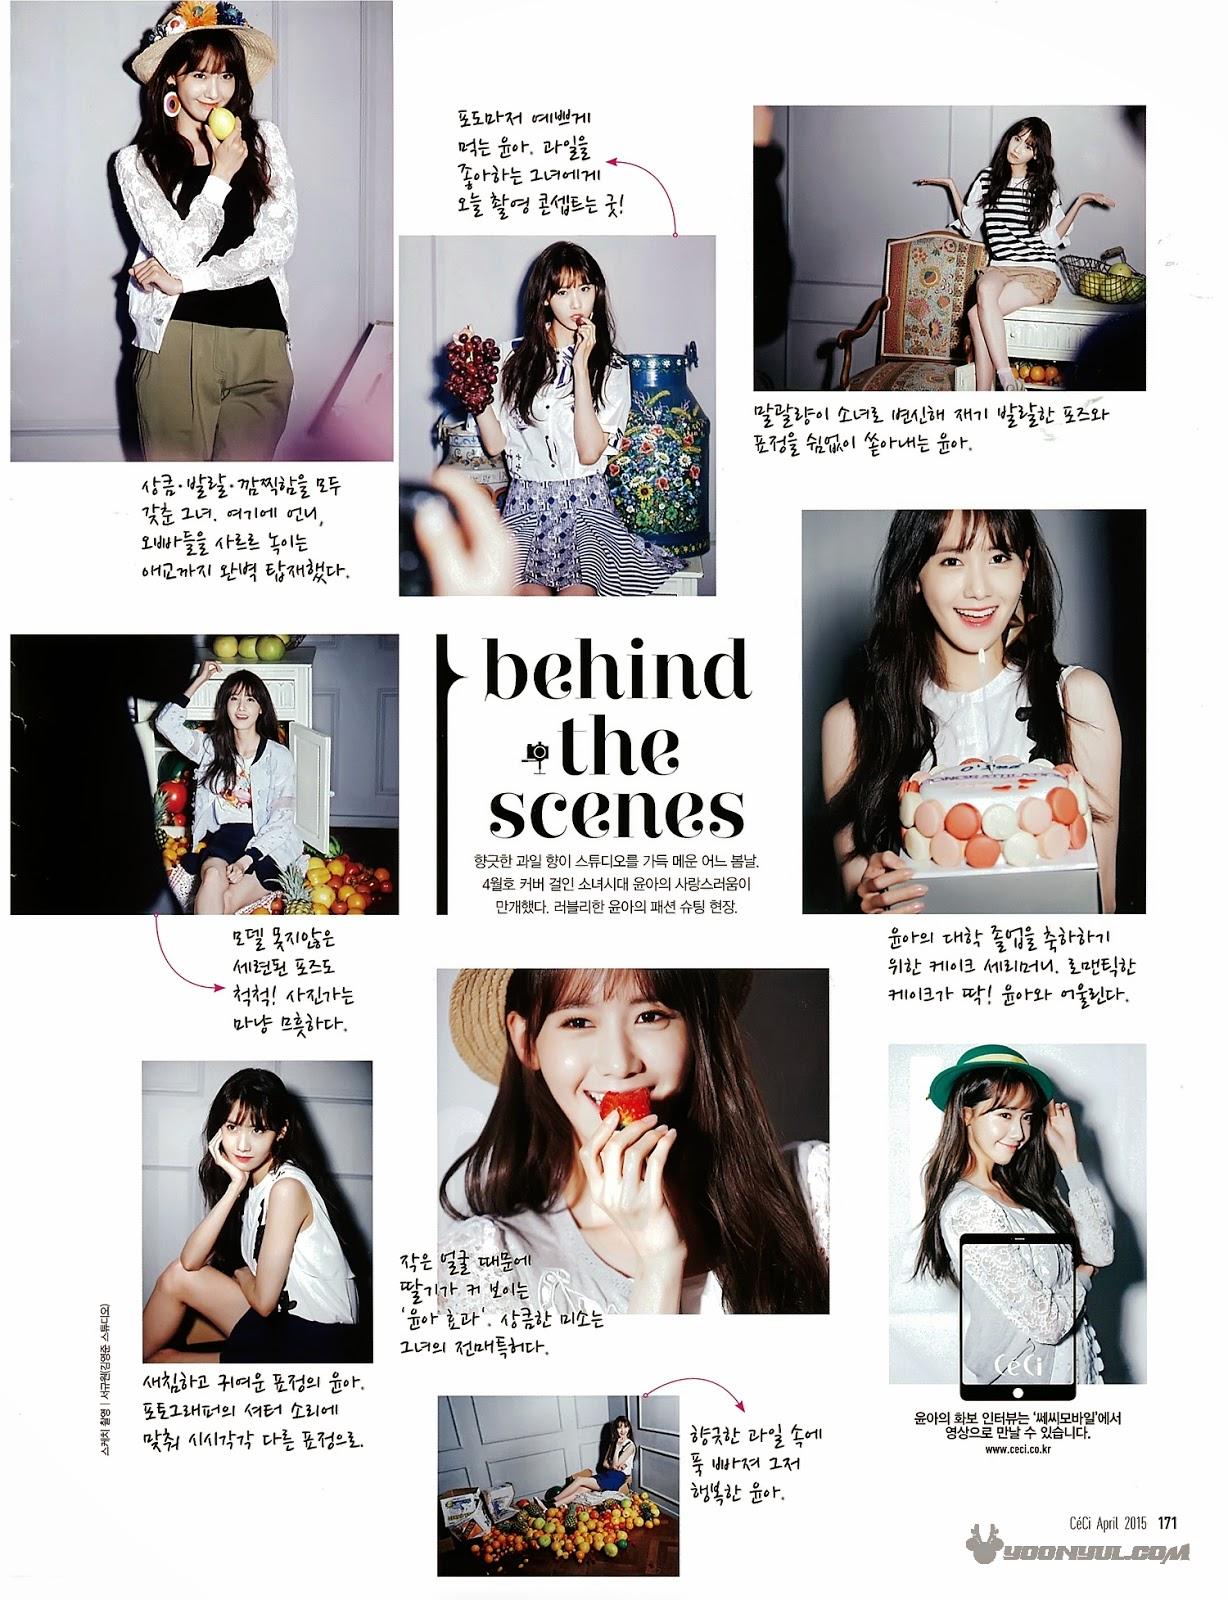 Yoona Girls' Generation CéCi April yoona pictorial yoona magazine cover model yoona ceci cover model K pop K-pop enjoykorea Taeyeon Sunny Tiffany Hyoyeon Yuri Sooyoung Yoona Seohyun